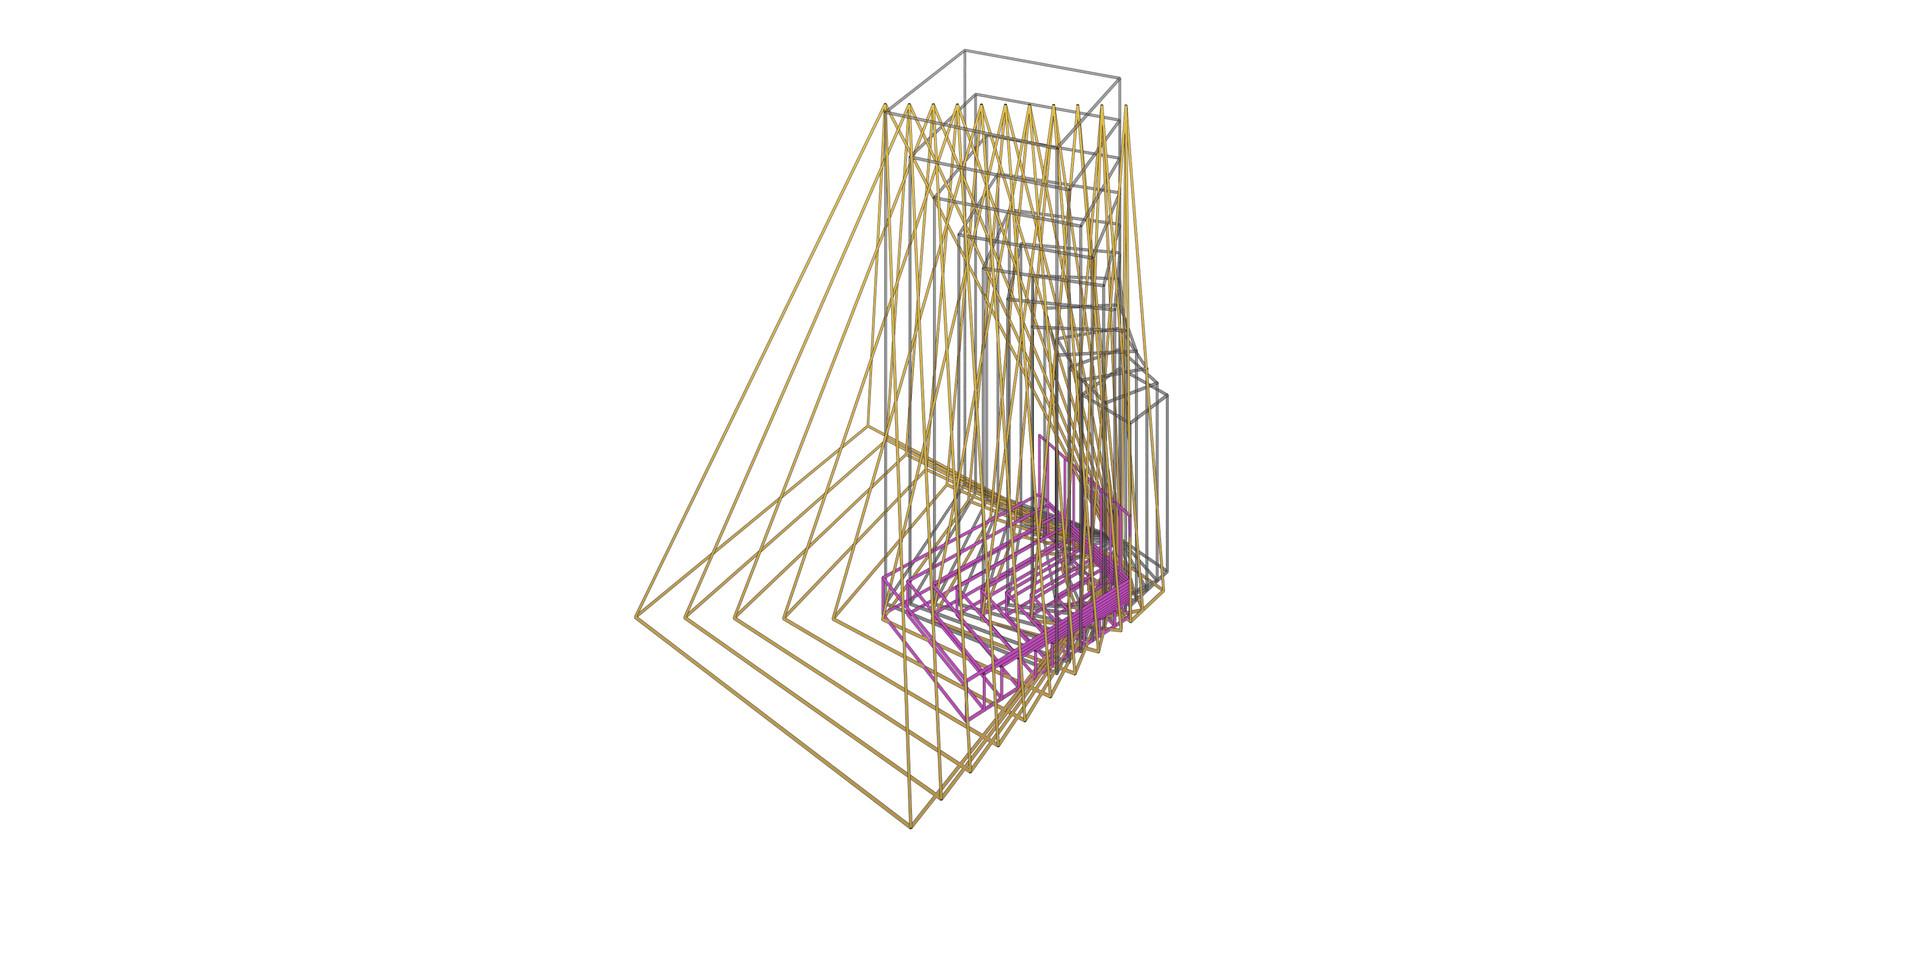 20200129_bacon_head wireframes [Converte